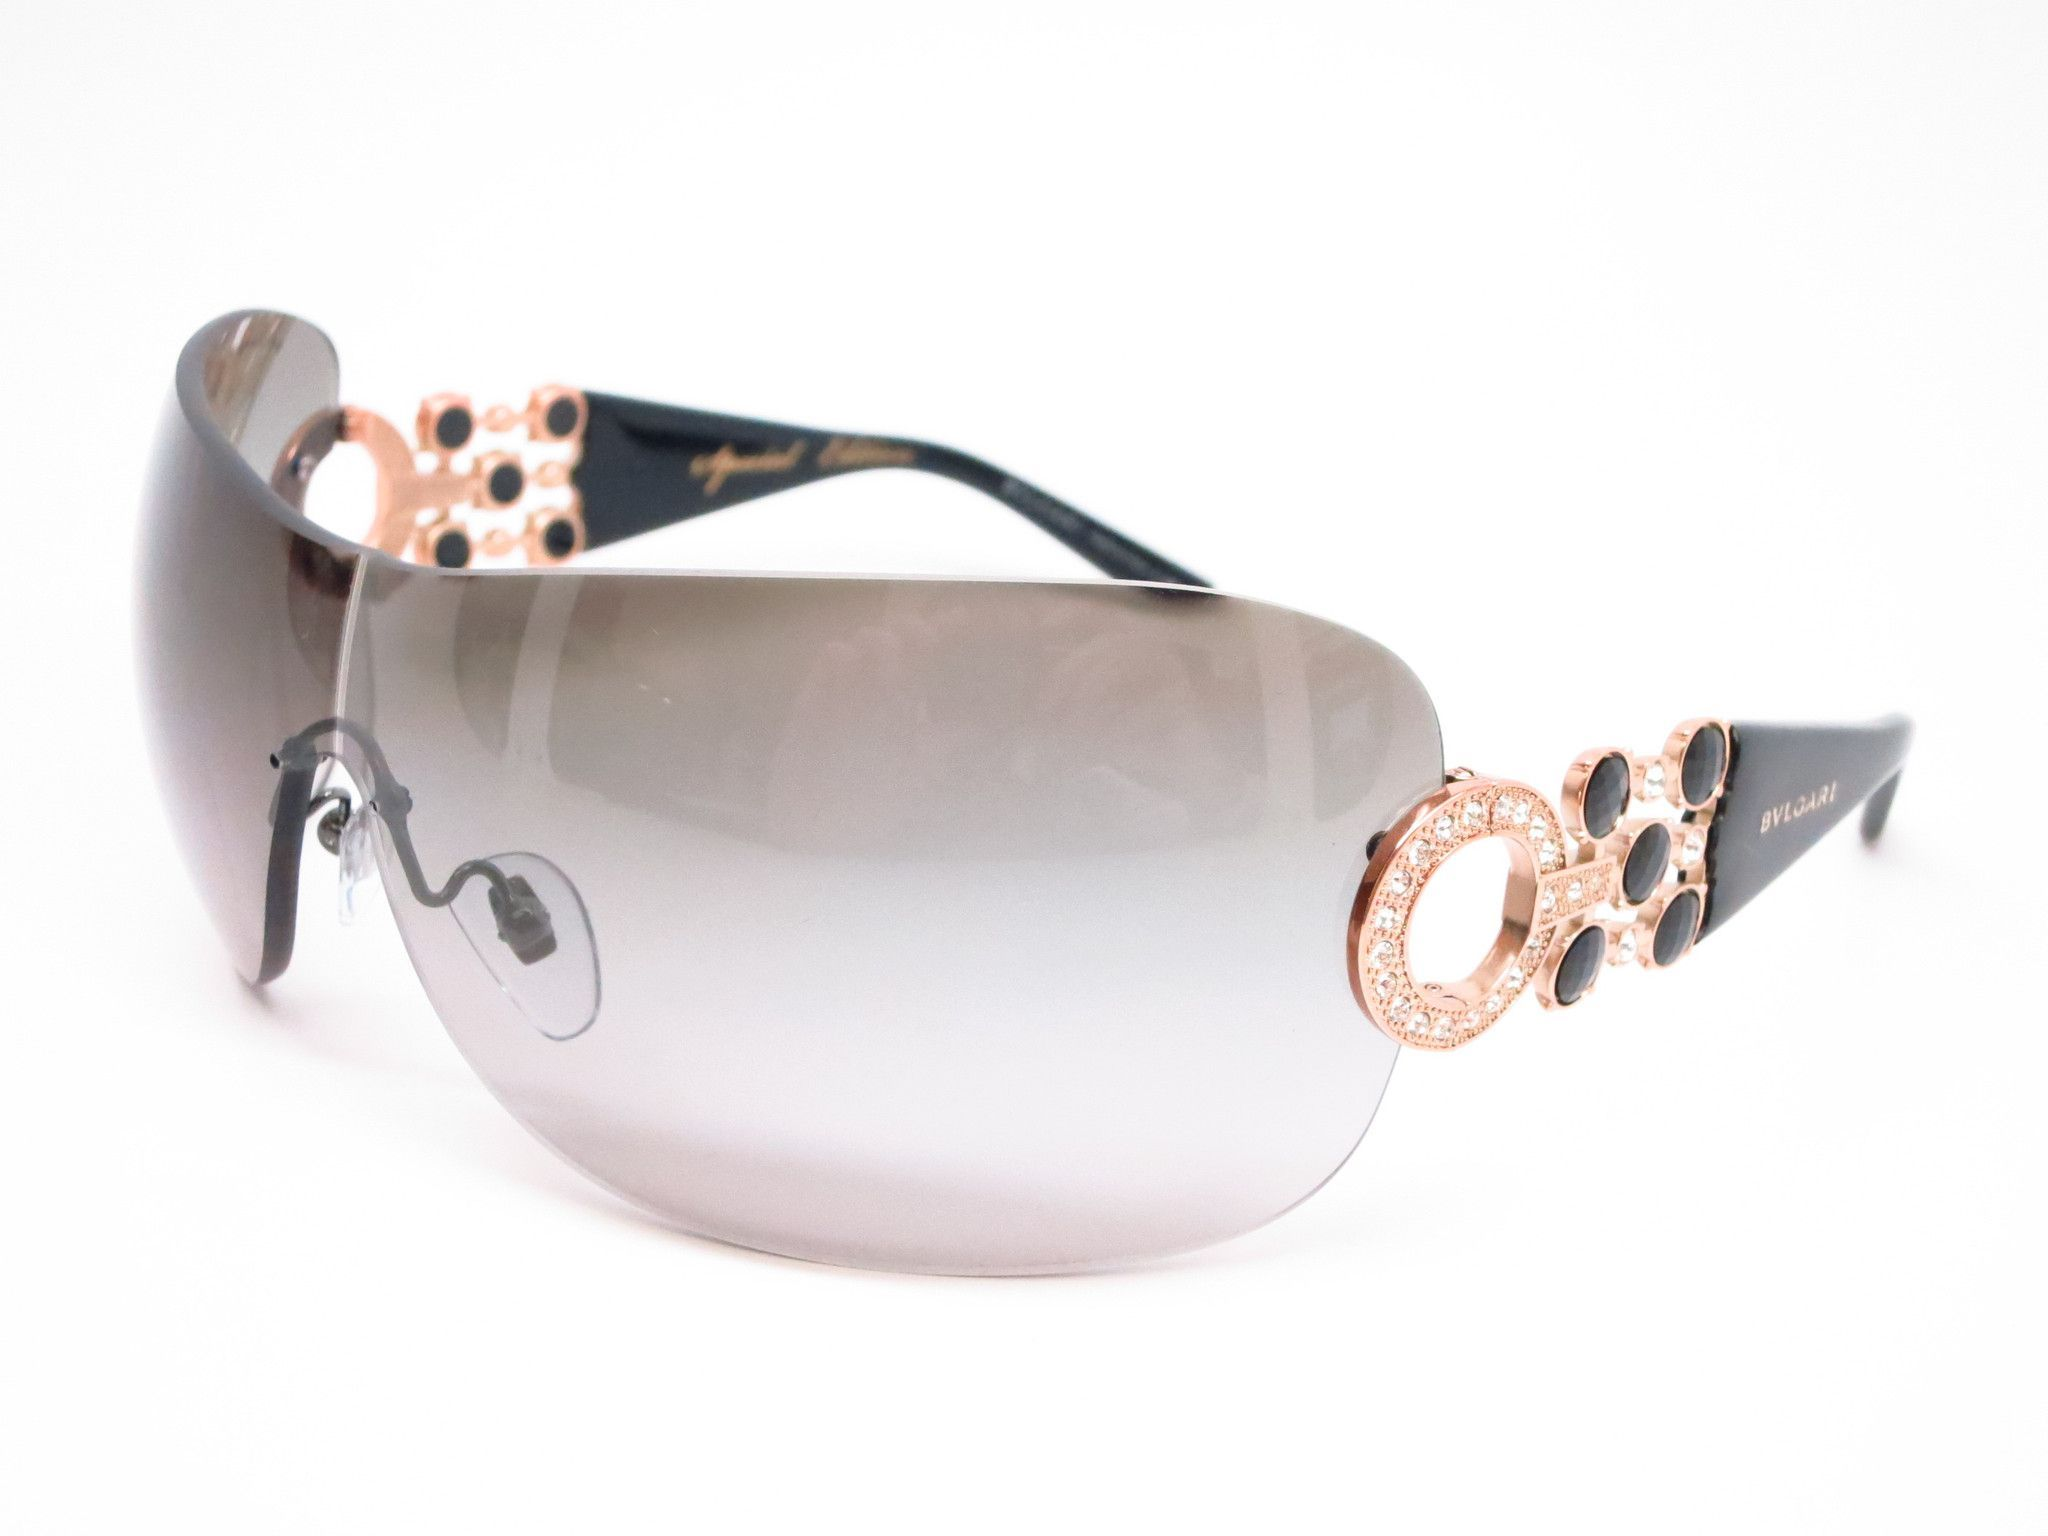 589291f945 Bvlgari BV 6063B 376 11 Pink Gold   Gloss Black Sunglasses